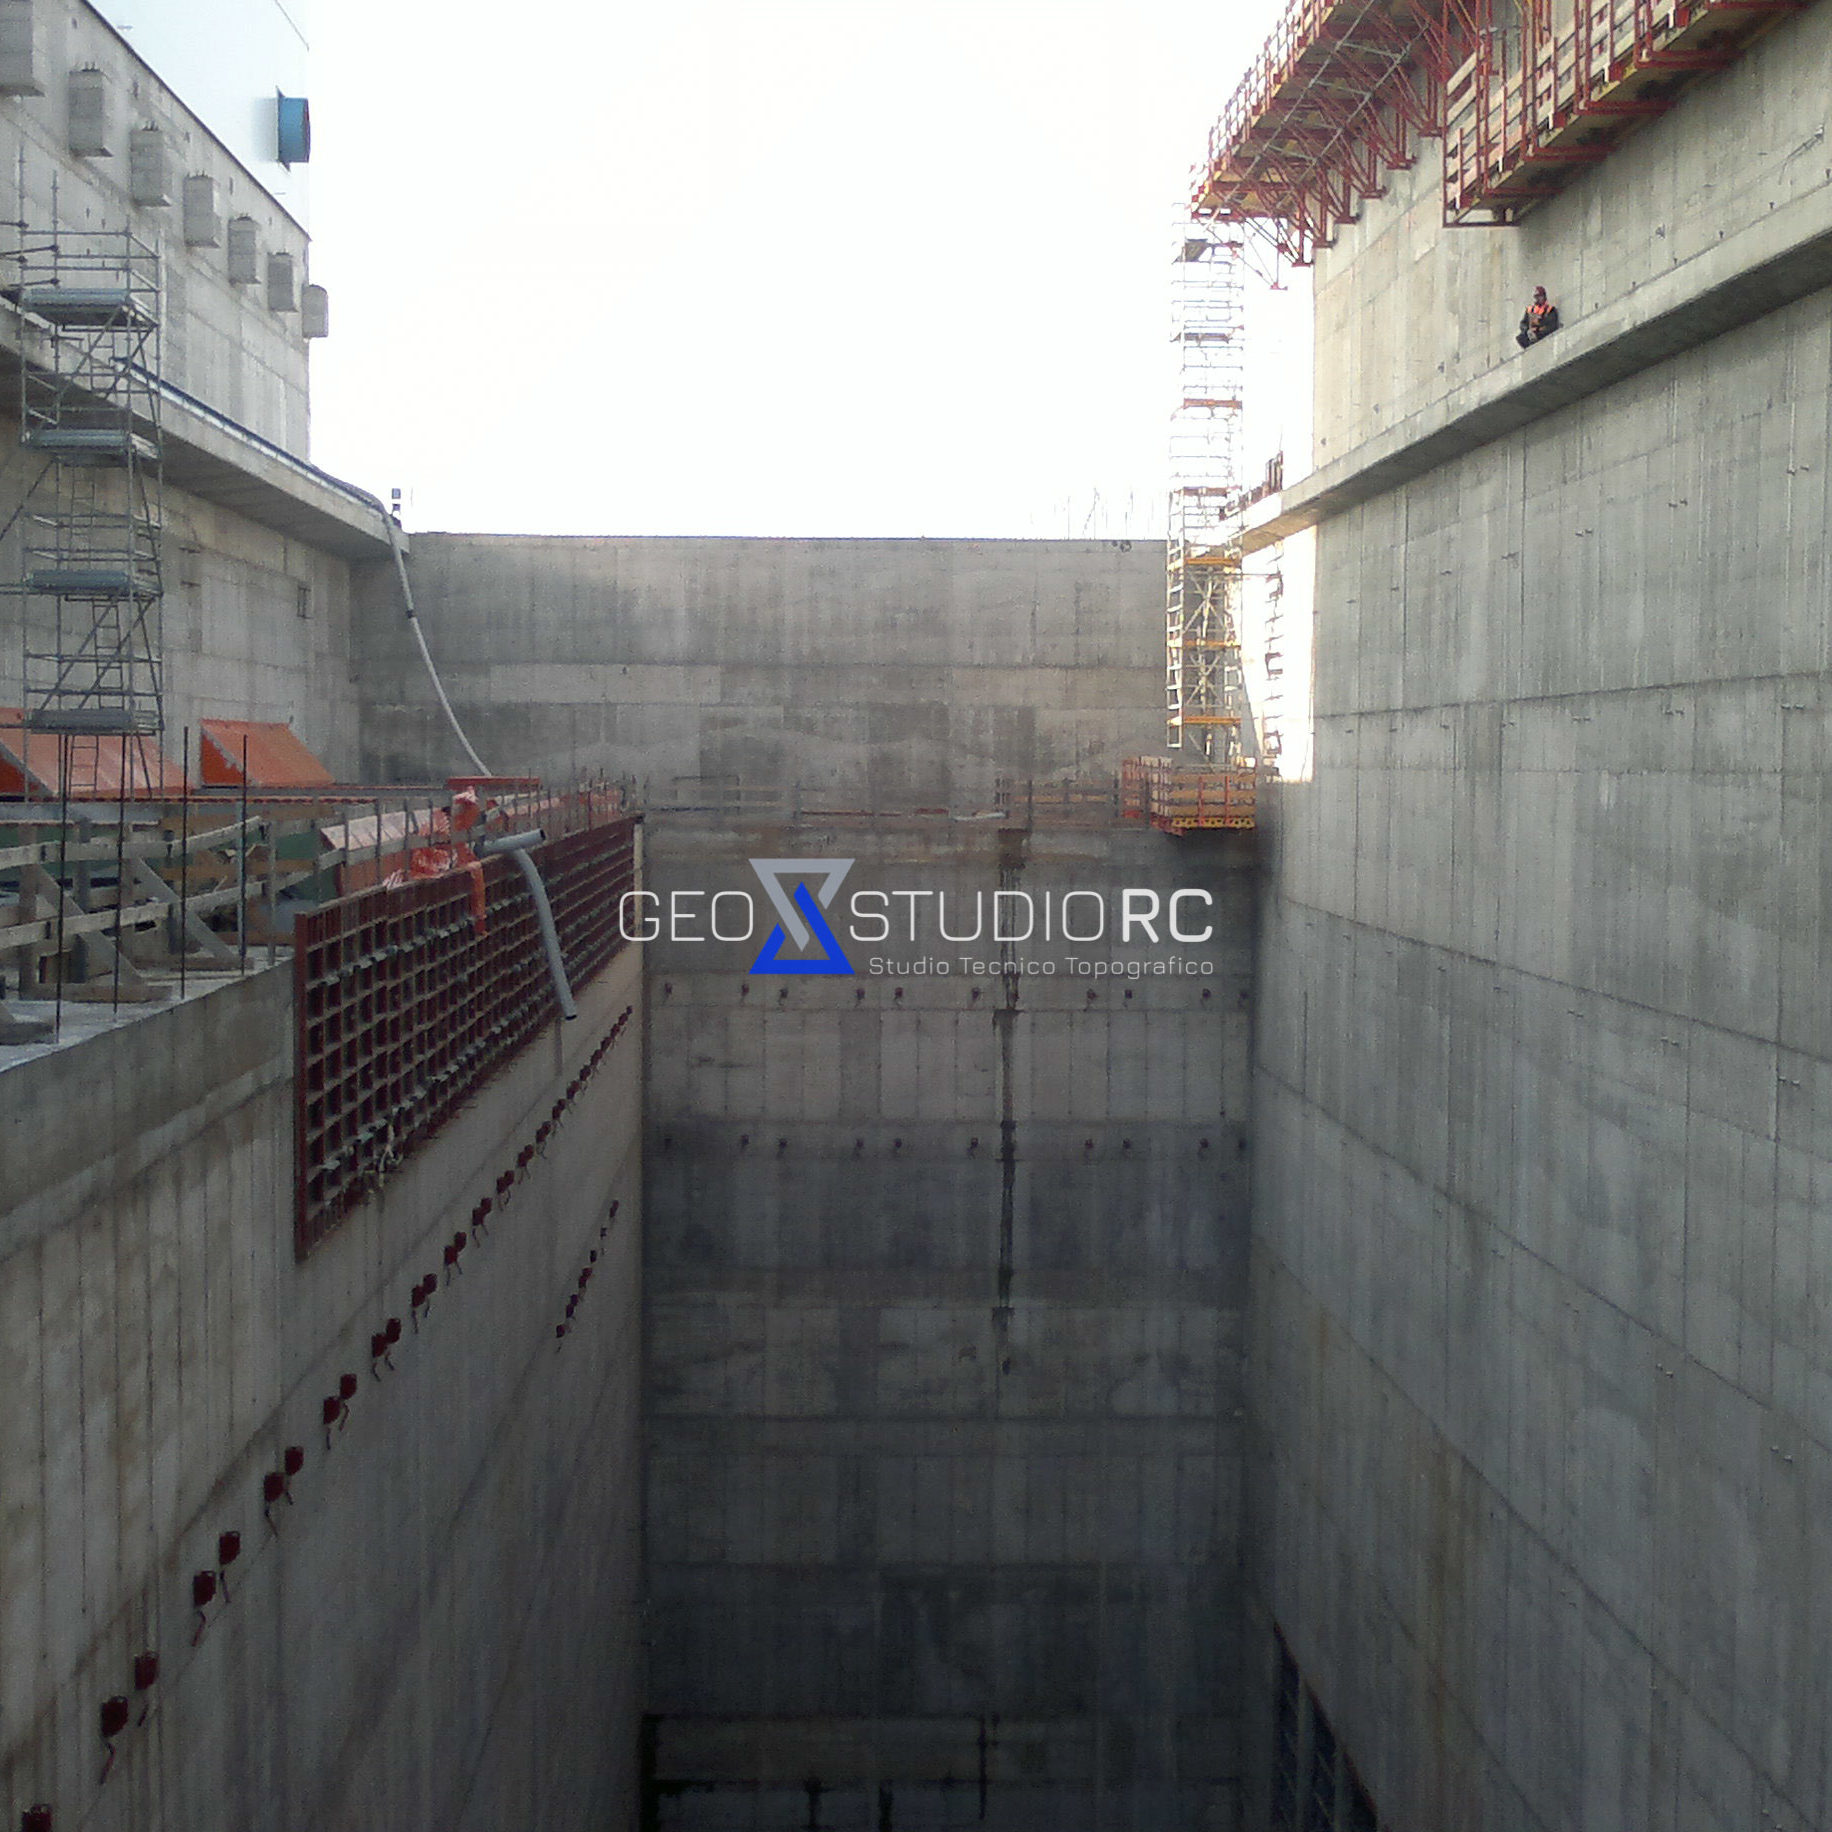 GeostudioRC_Cantiere-2